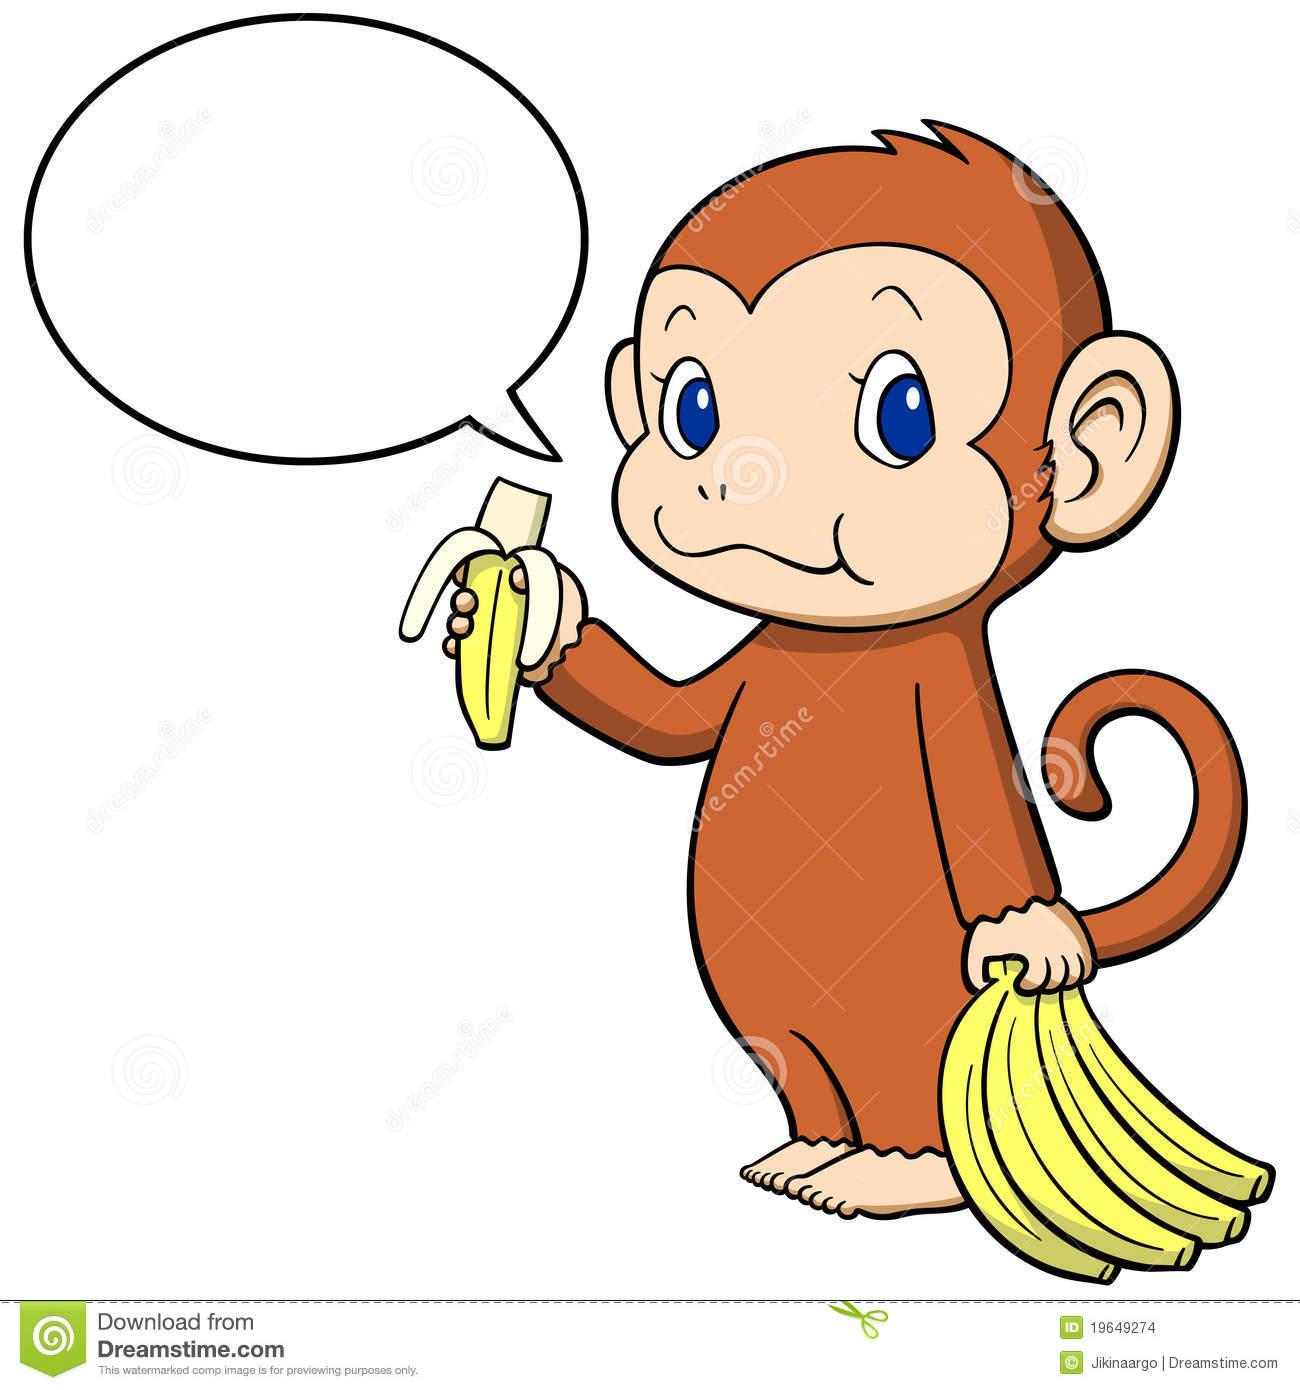 1300x1390 Child banana clipart, explore pictures